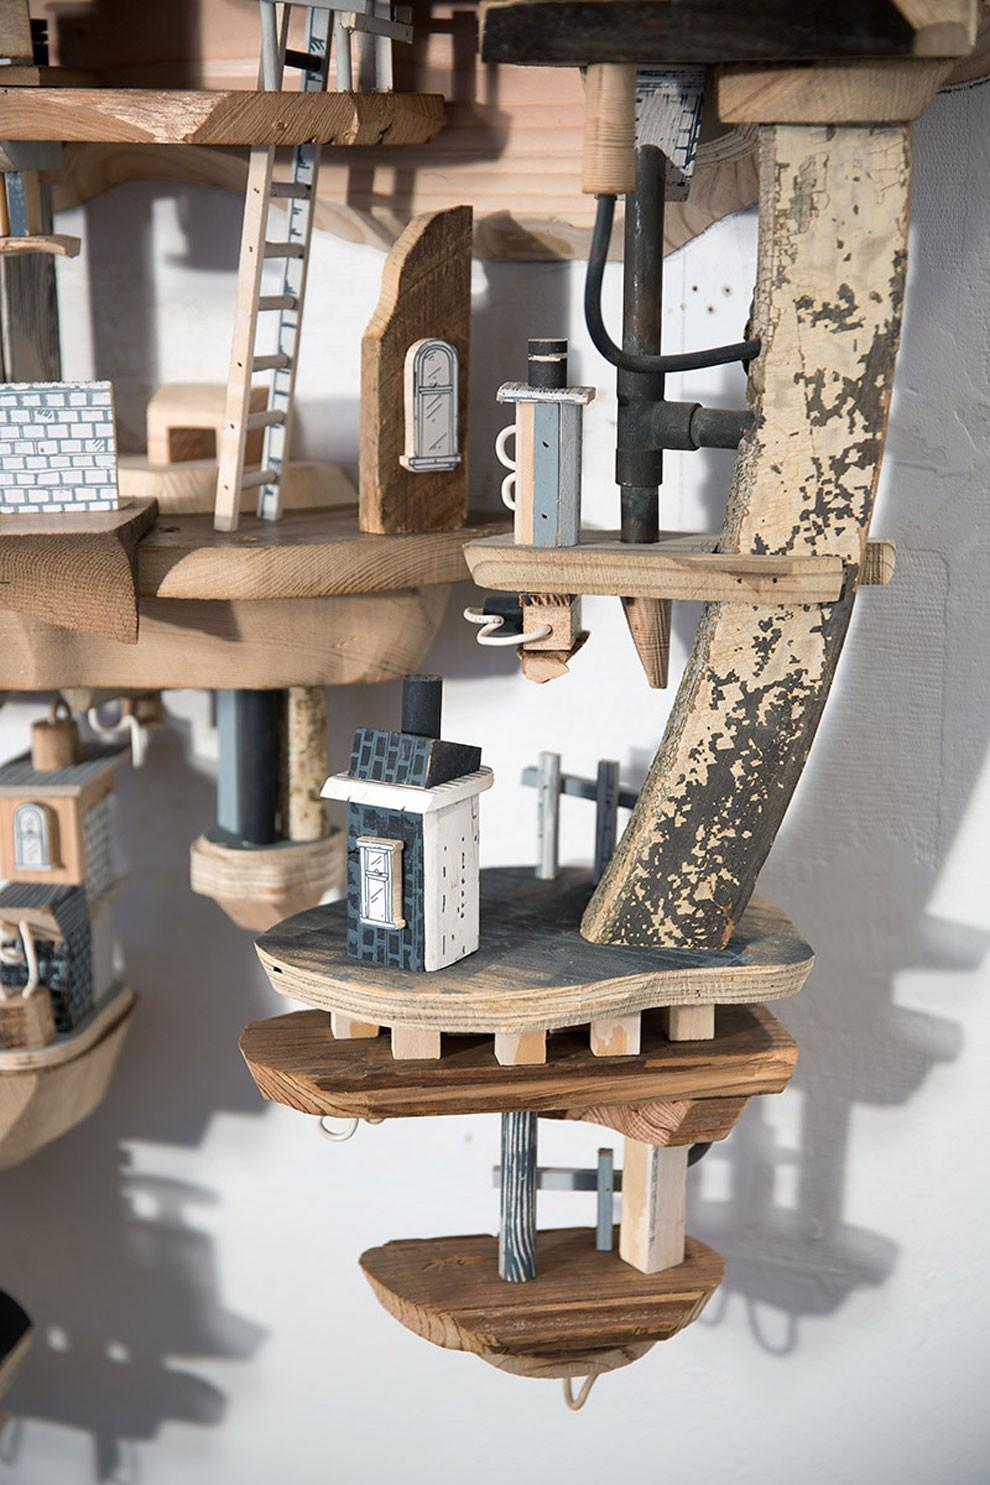 illustrazioni-scultura-mondi-miniatura-architettura-luke-o-sullivan-08